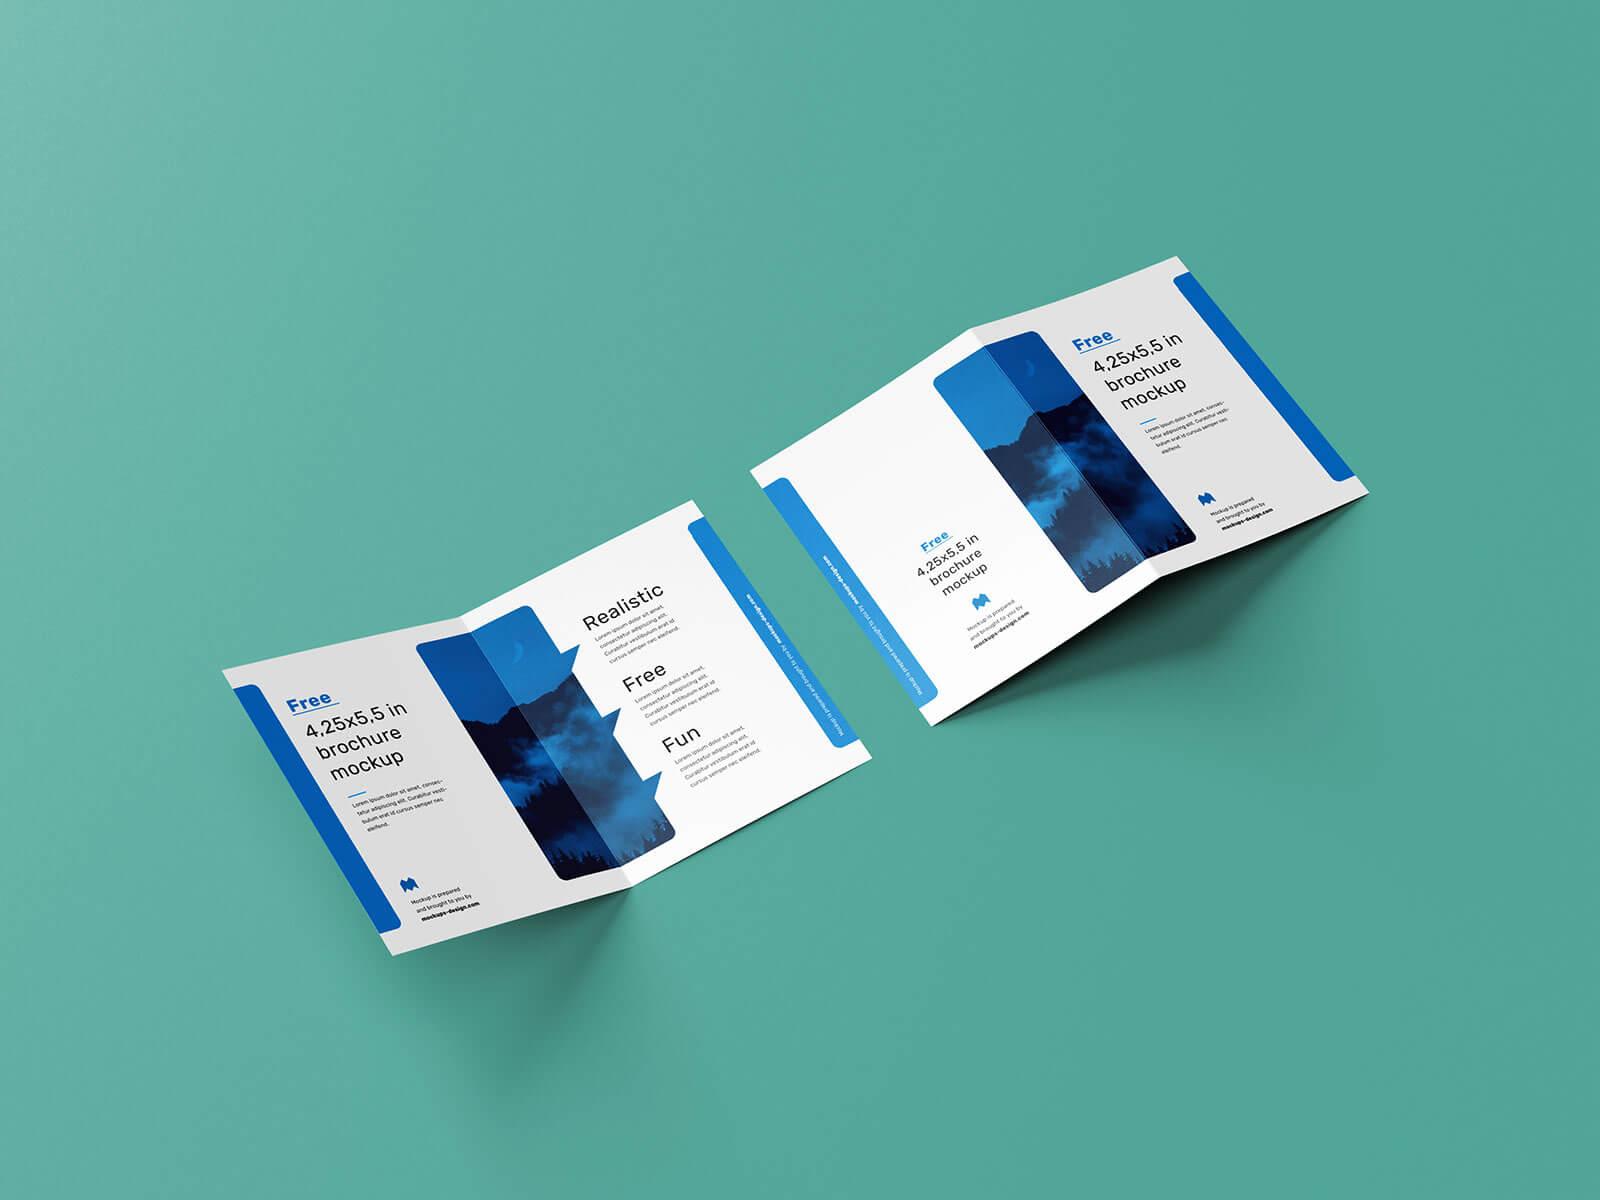 Free Bi-Fold Quarter Page Brochure Mockup PSD Set